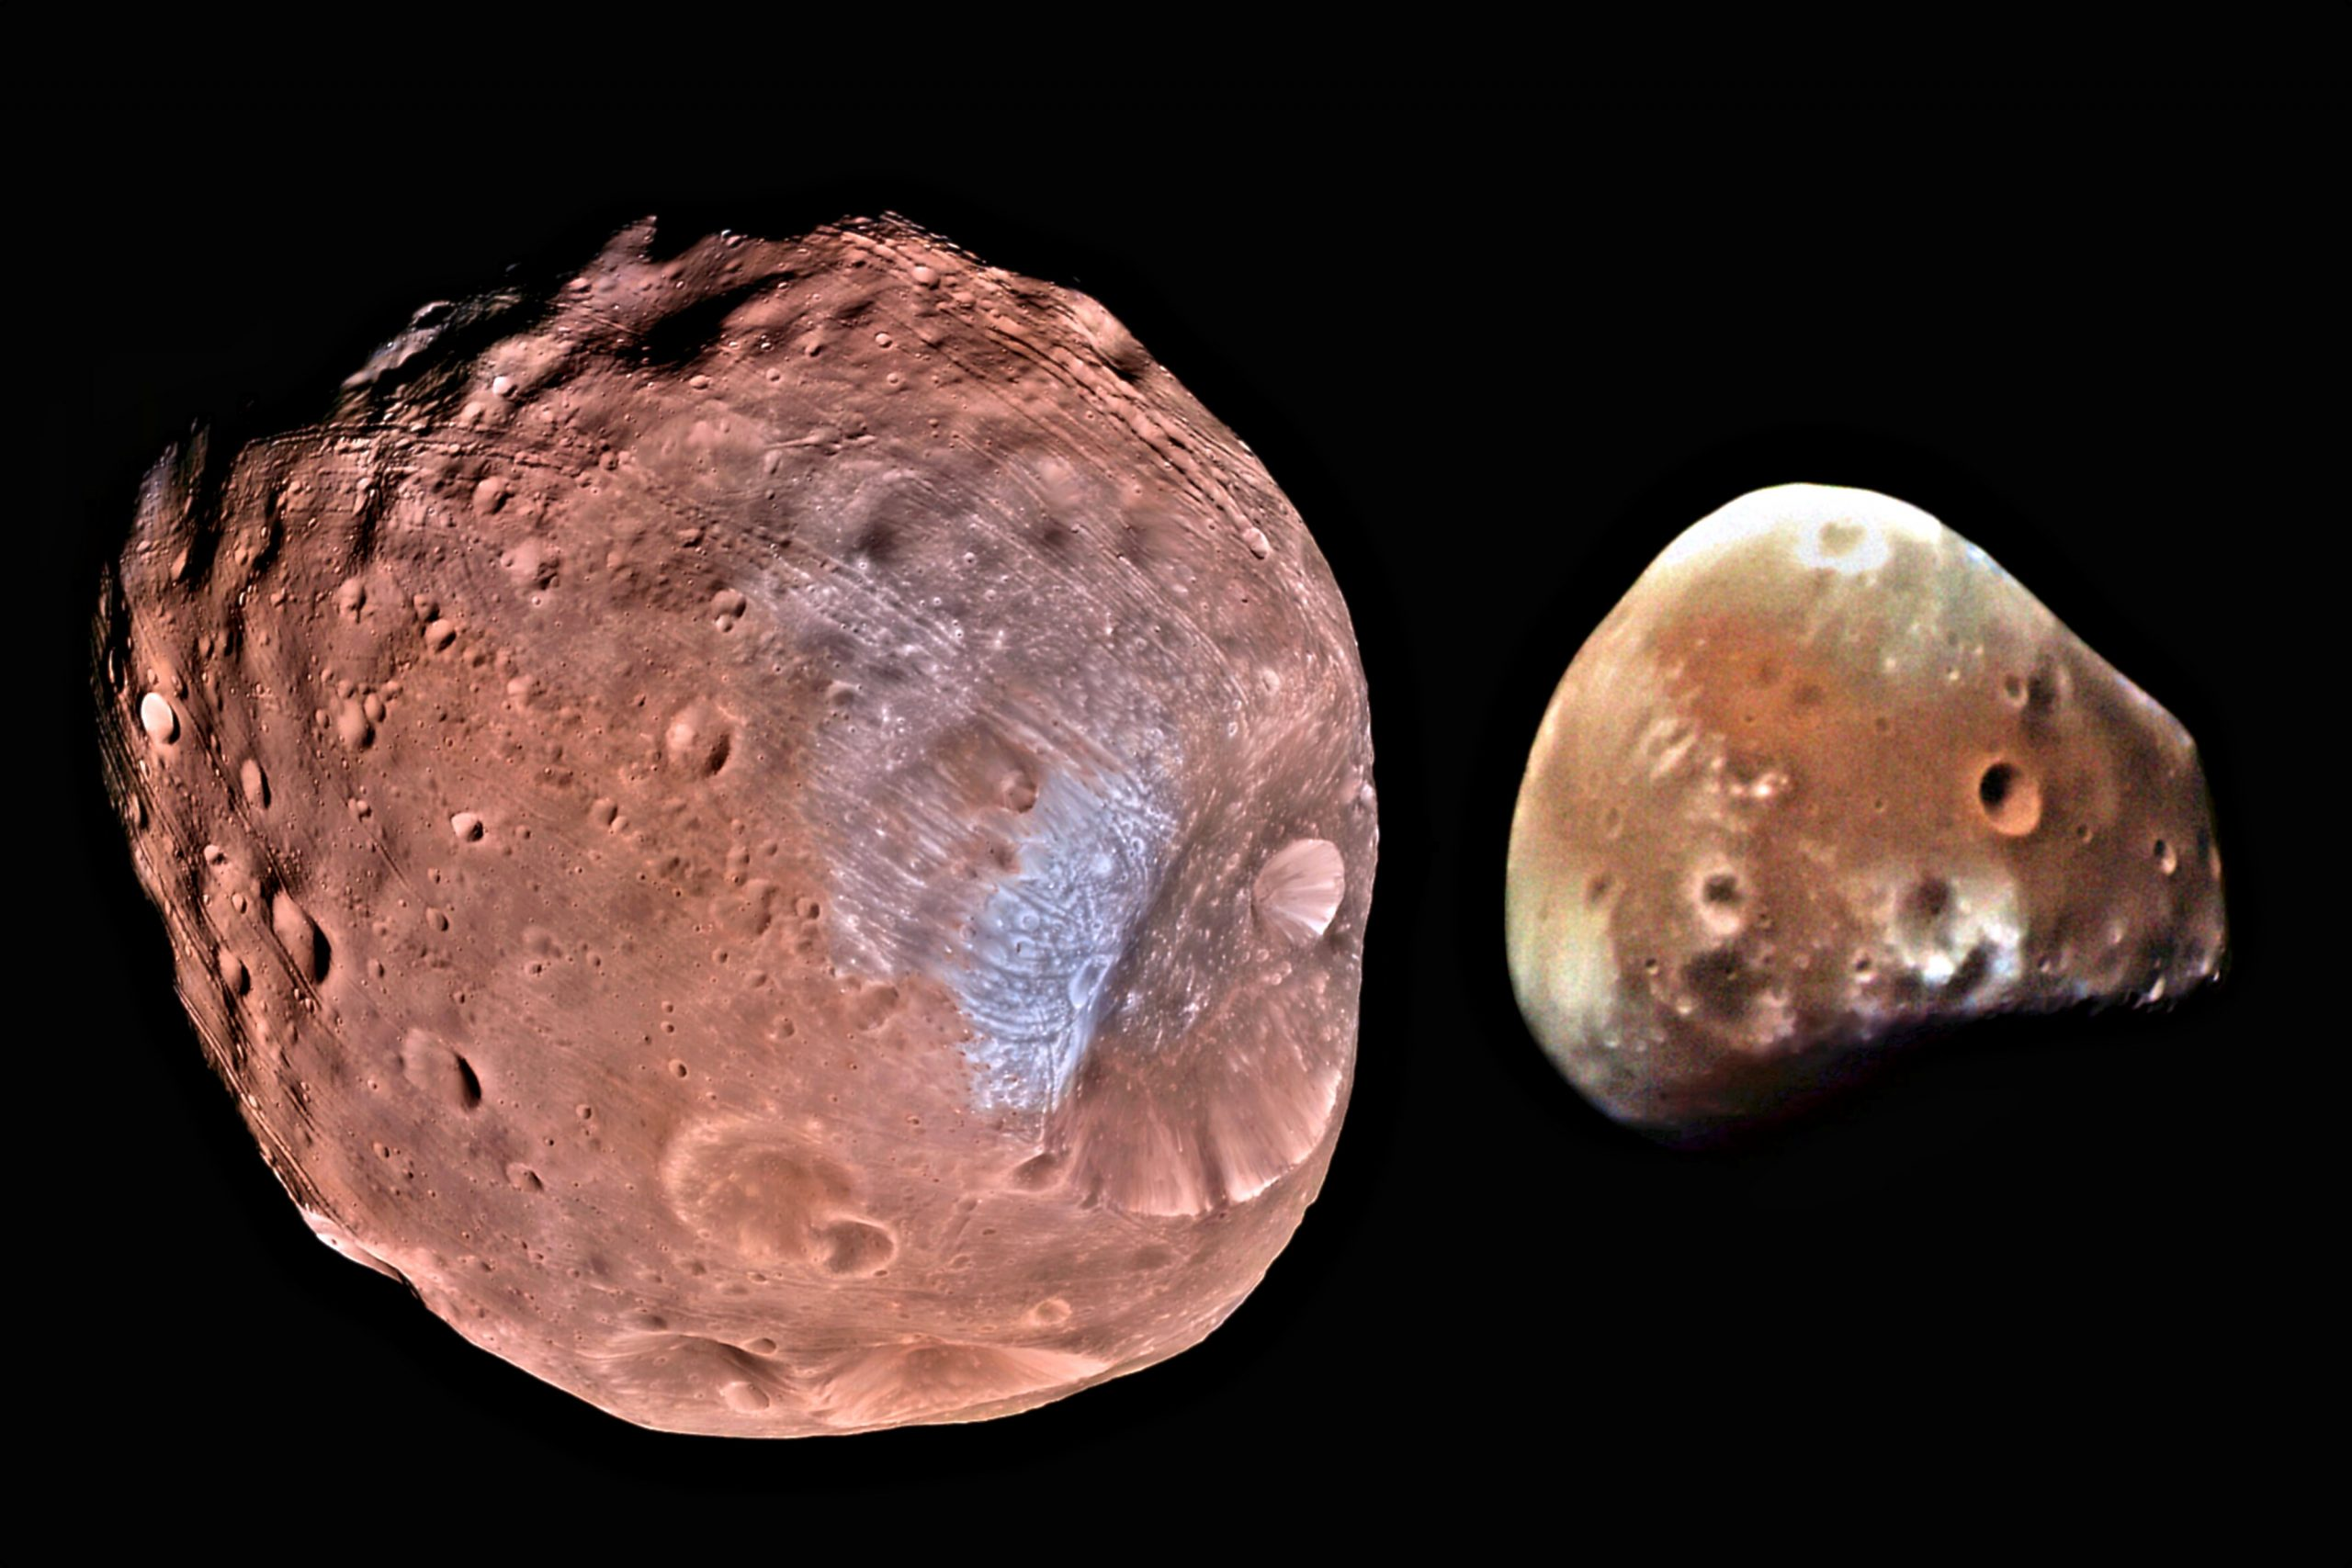 Fobos i Deimos. Izvor: NASA/JPL-Caltech/University of Arizona, Giuseppe Donatiello HiRISE instrument on the Mars Reconnaissance Orbiter